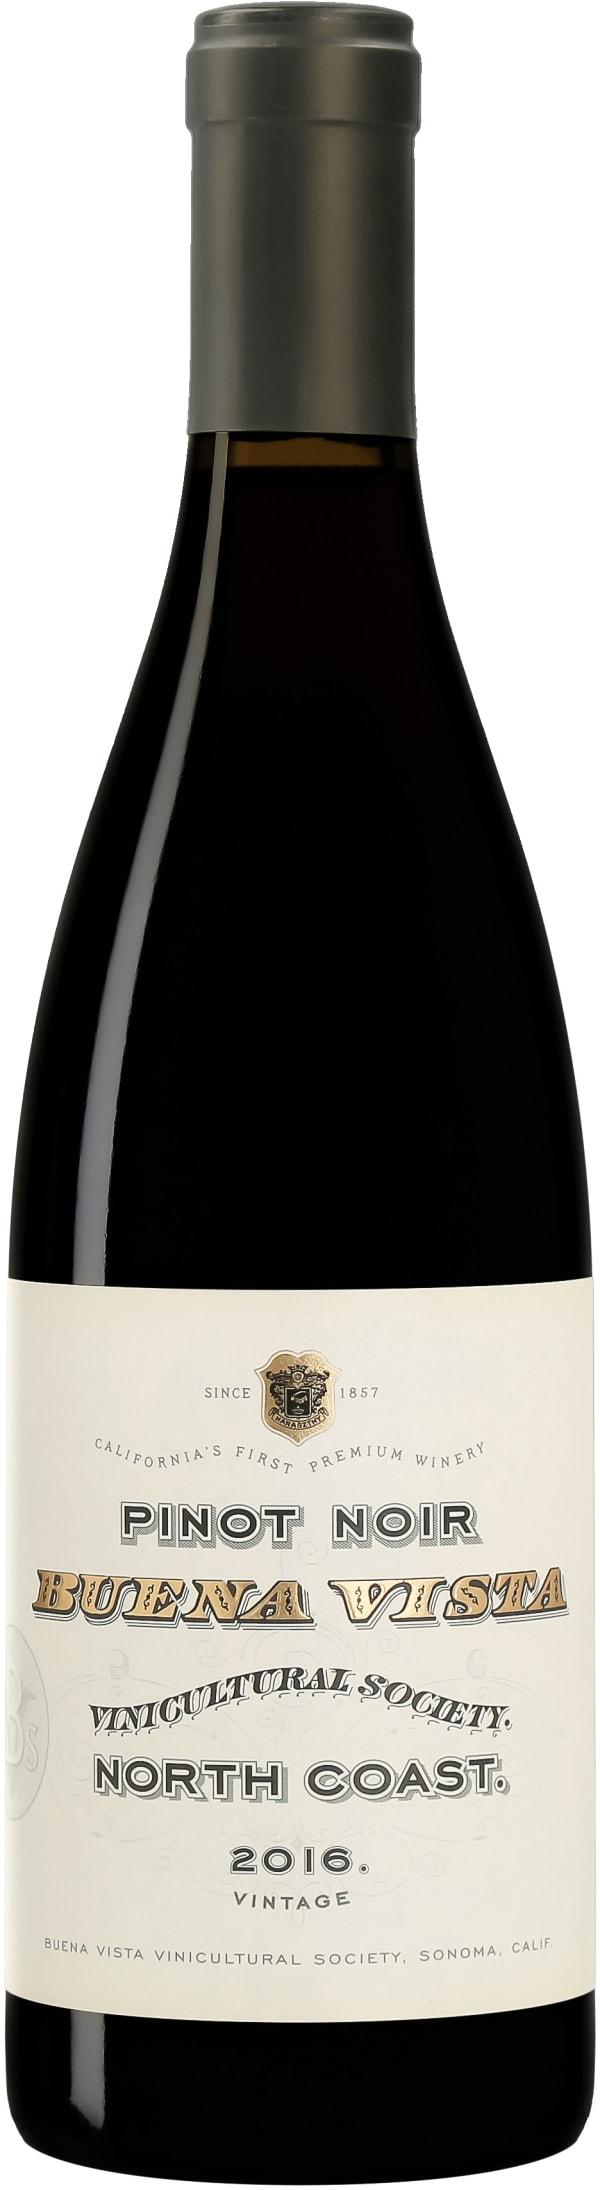 Buena Vista North Coast Pinot Noir 2016